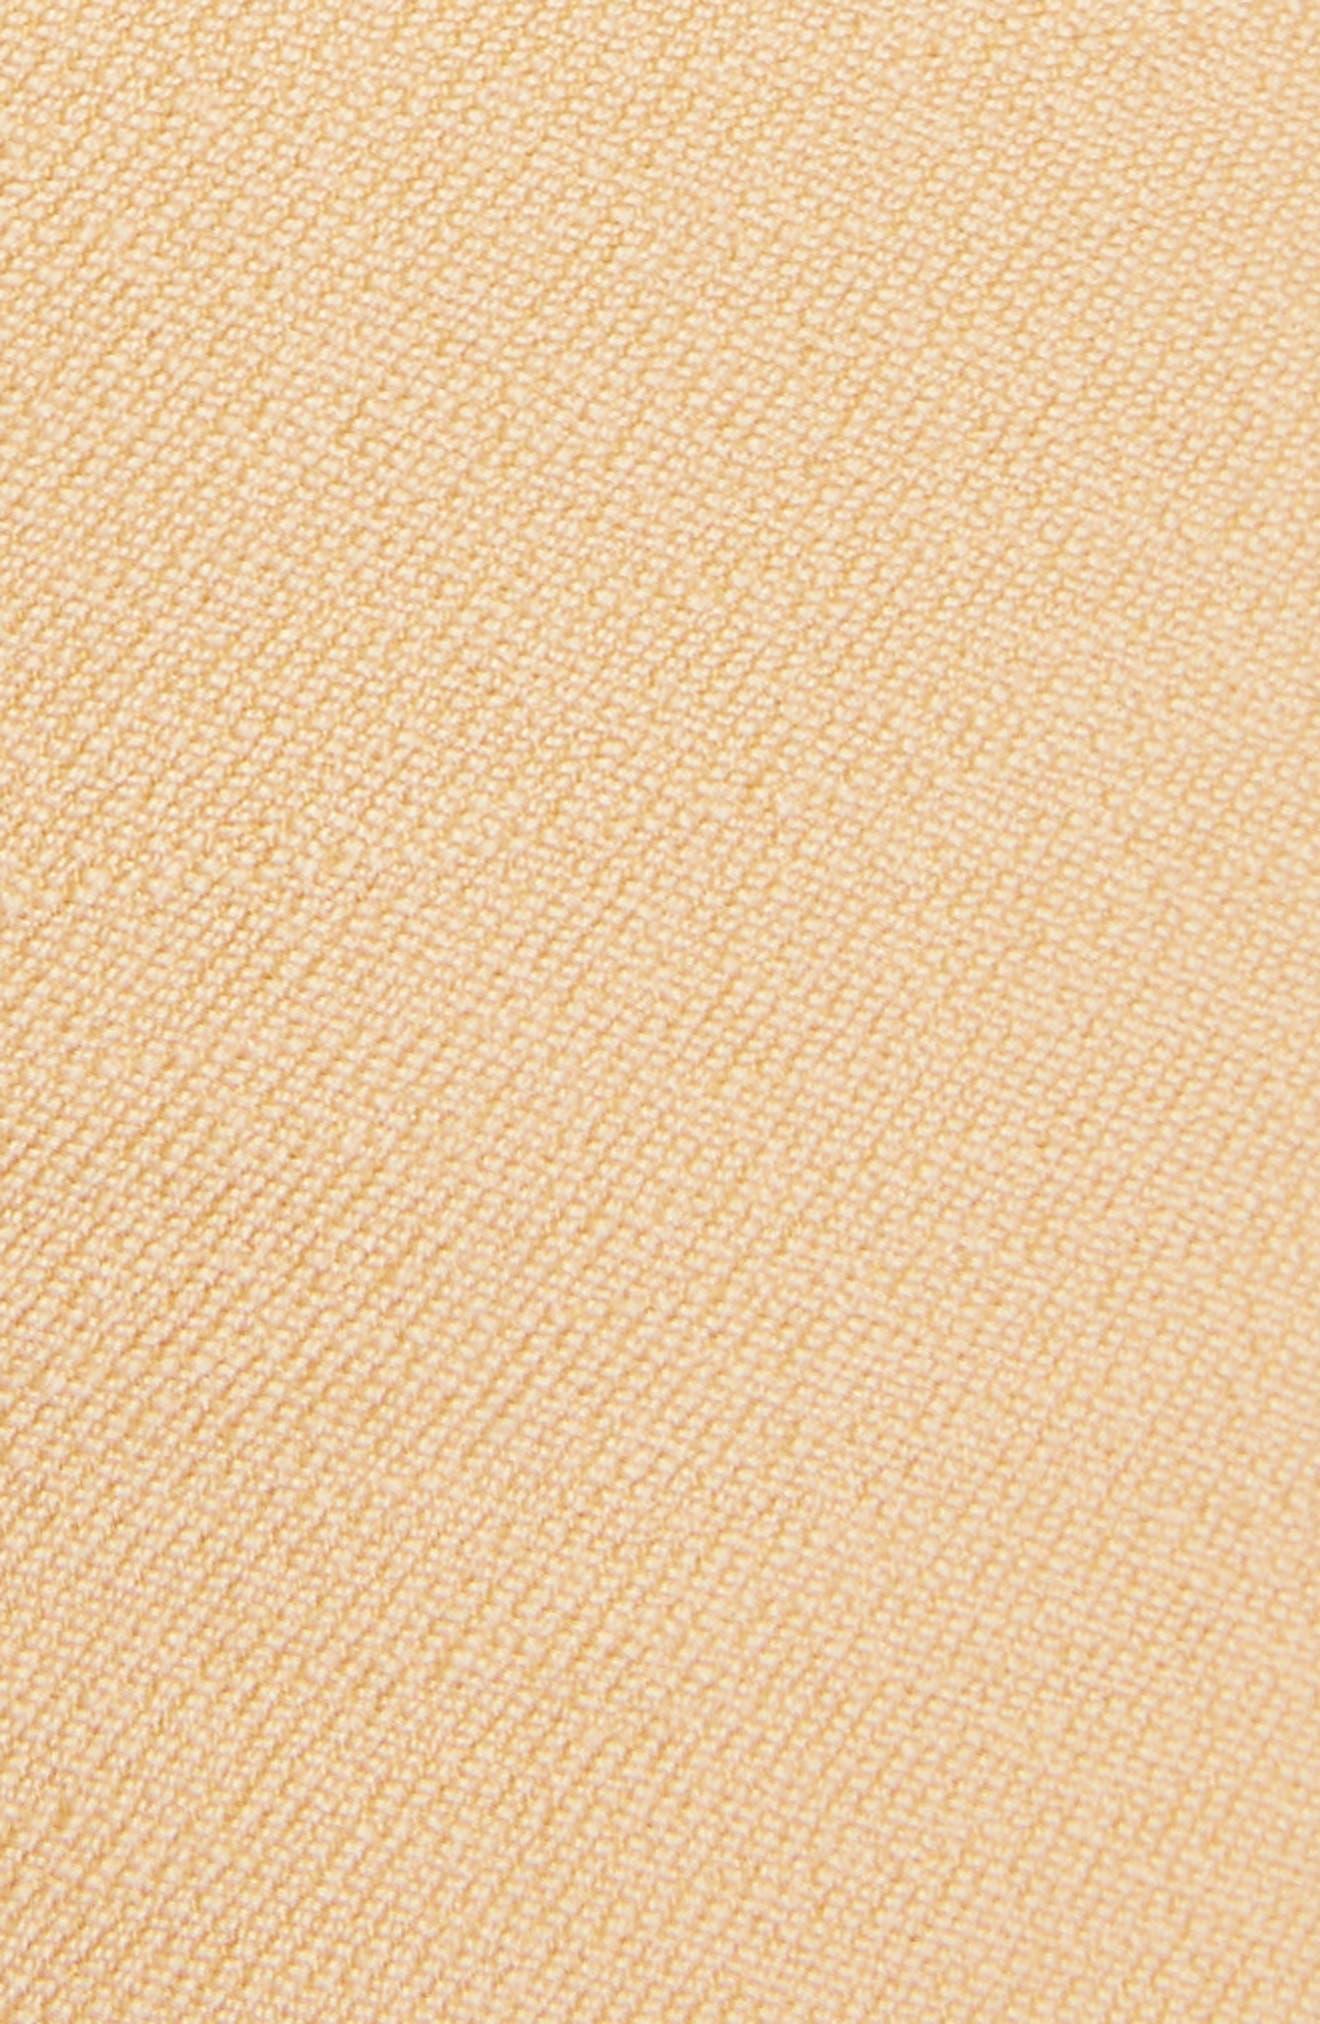 Side Pleat Wool & Silk Blend Shorts,                             Alternate thumbnail 6, color,                             Quiet Brown